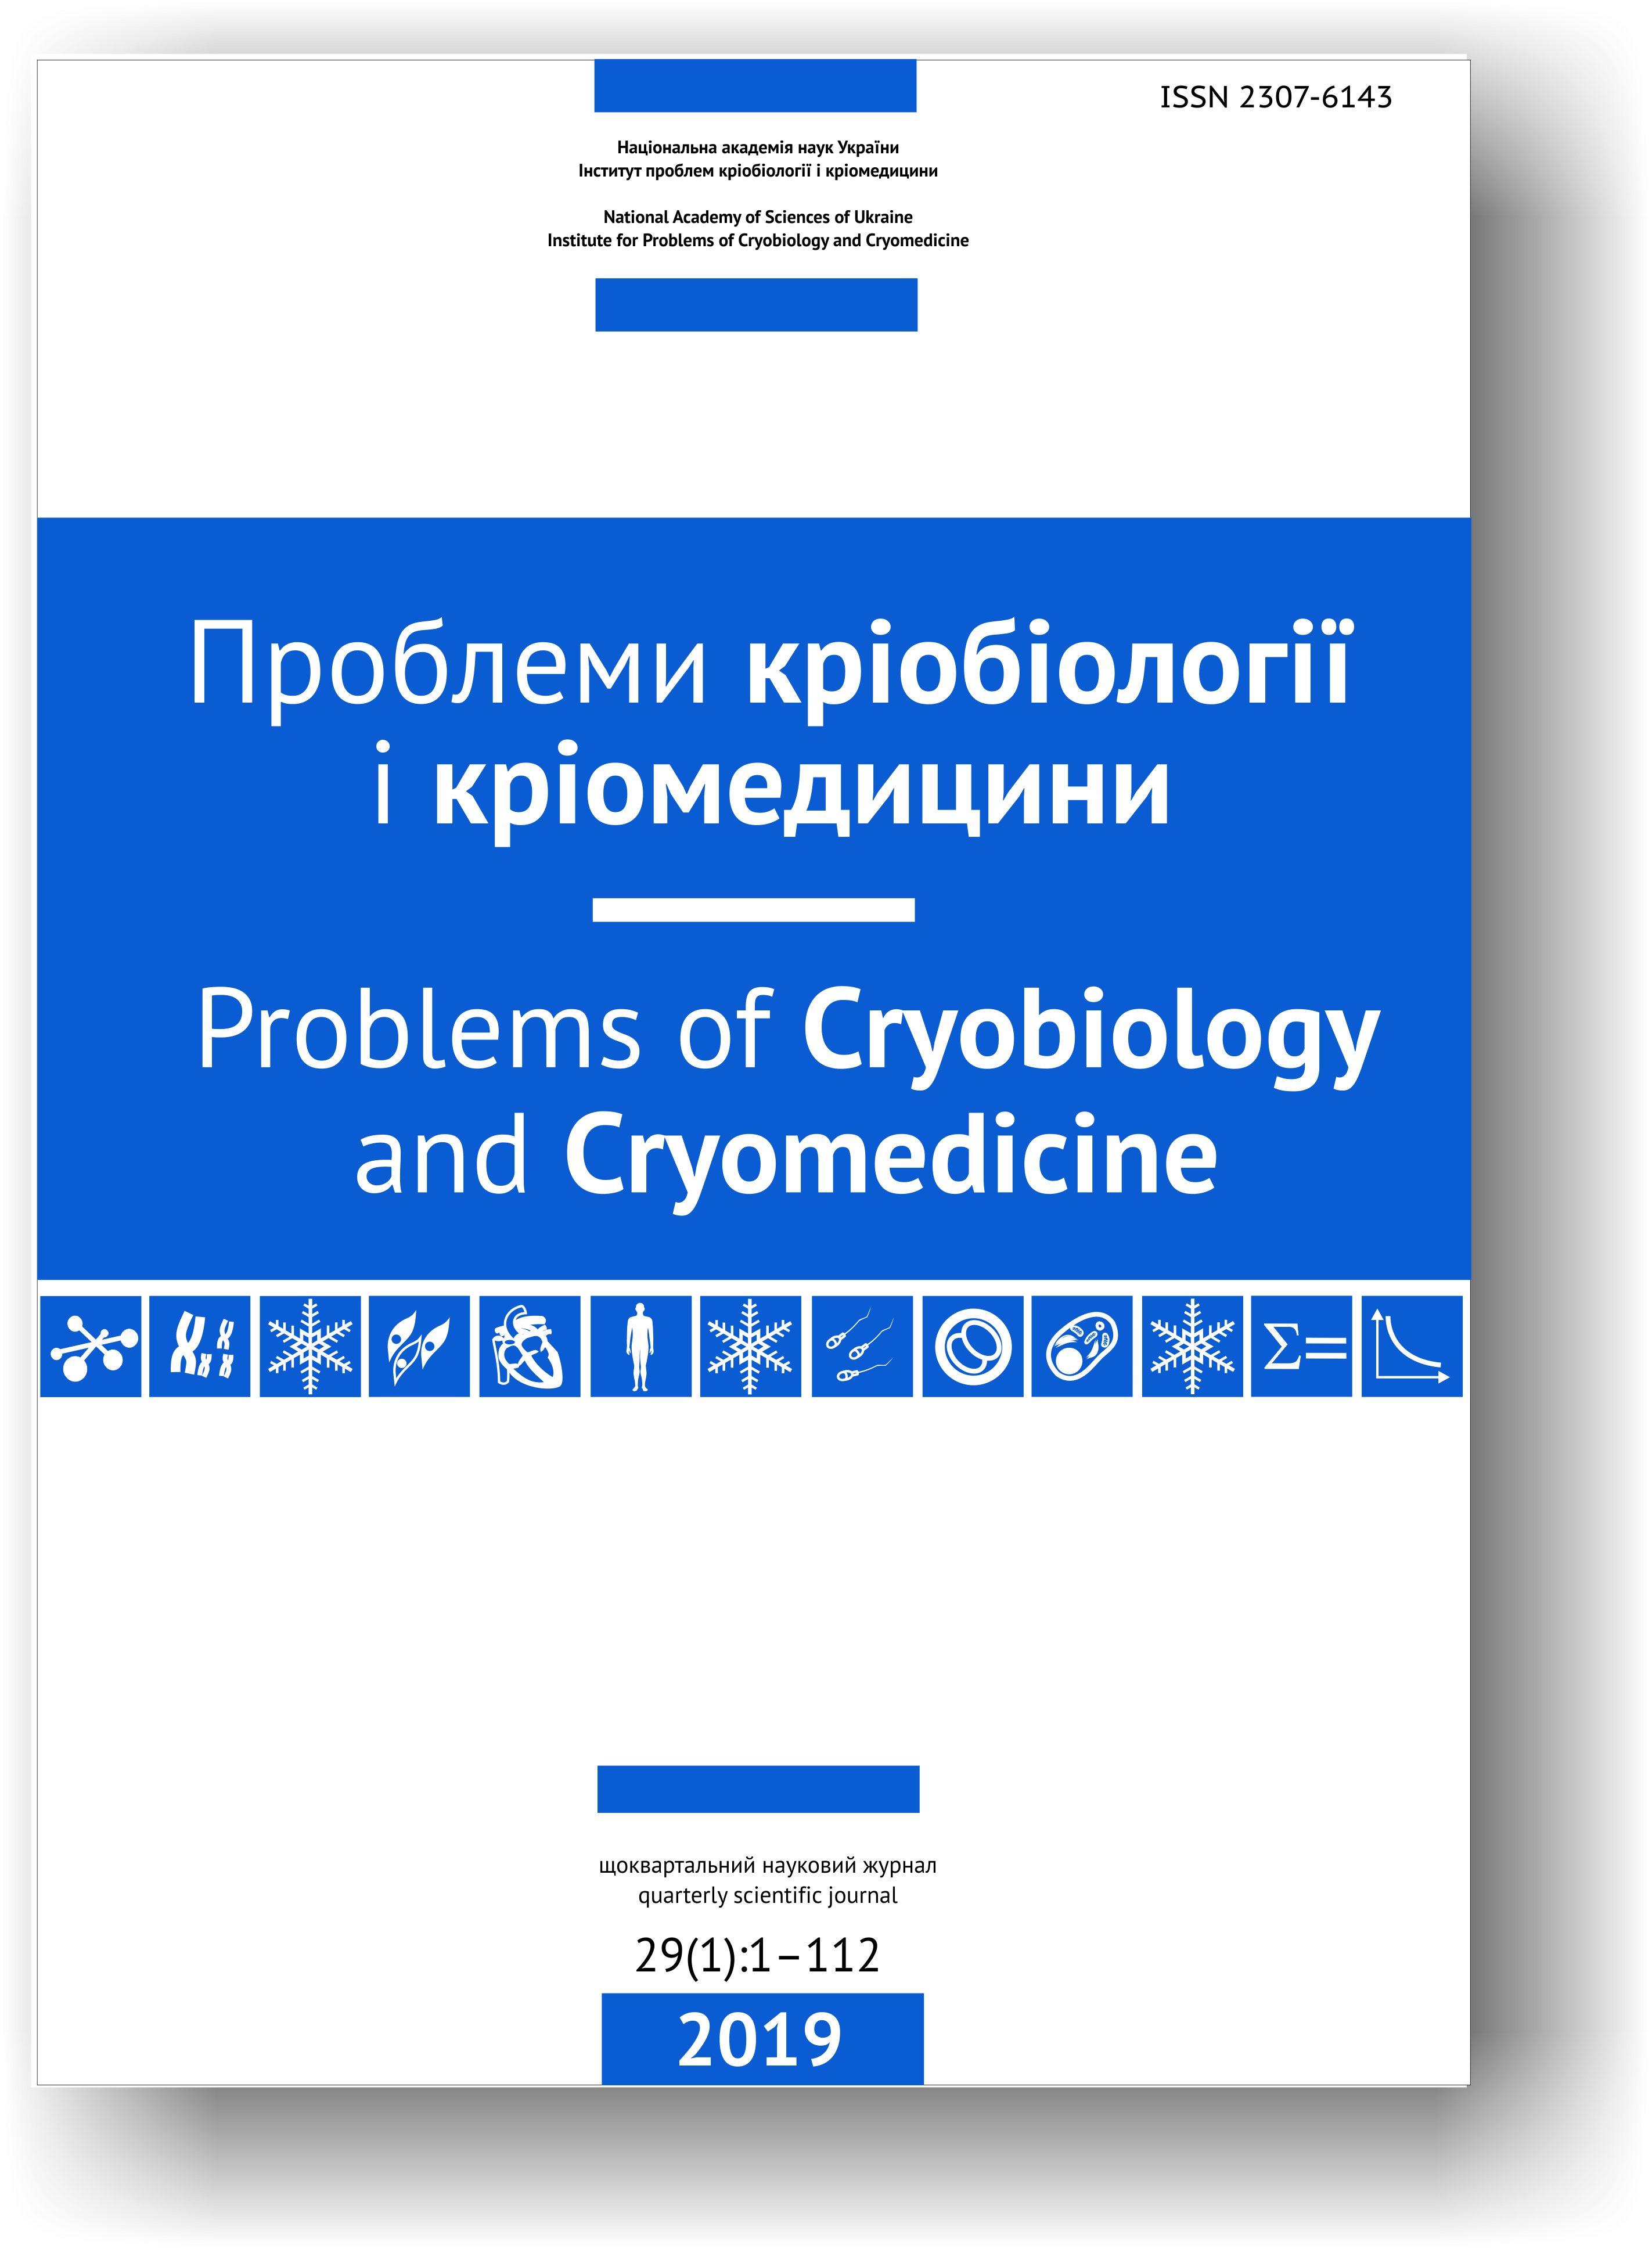 View Vol. 29 No. 1 (2019): Probl Cryobiol Cryomed